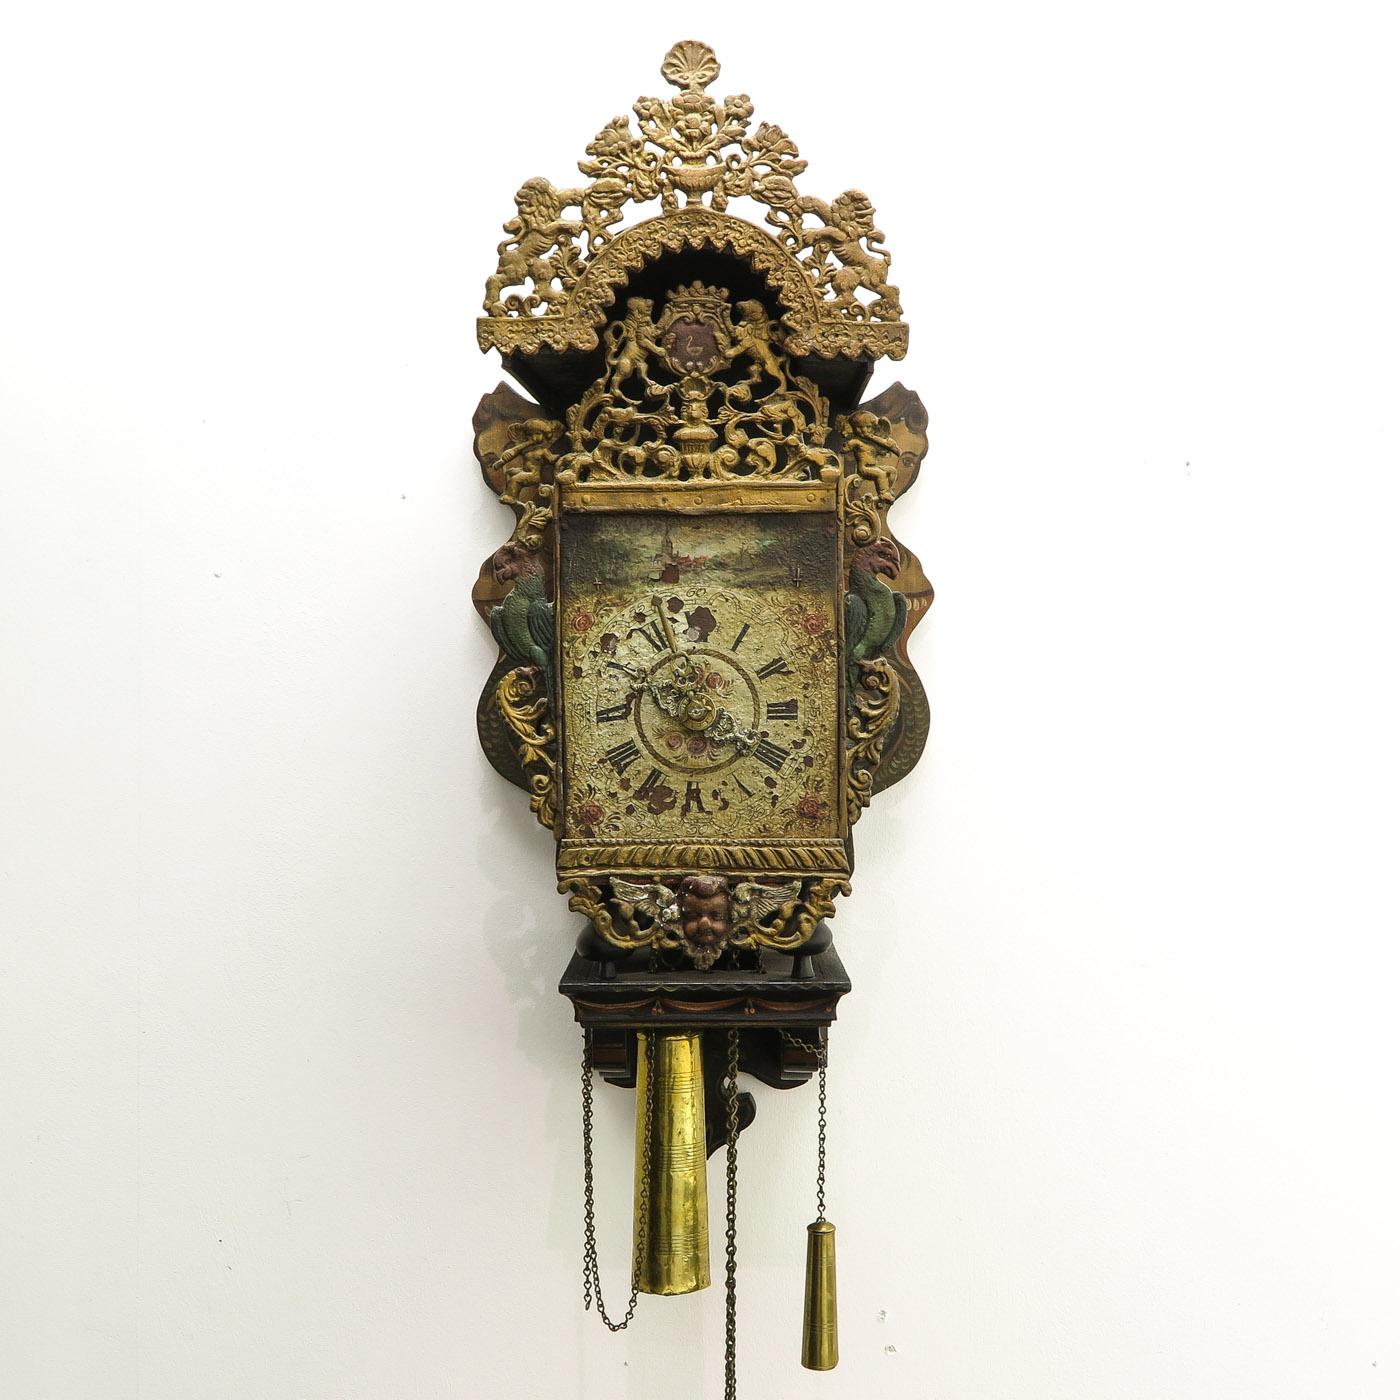 Lot 1025 - An 18th - 19th Century Friesland Clock